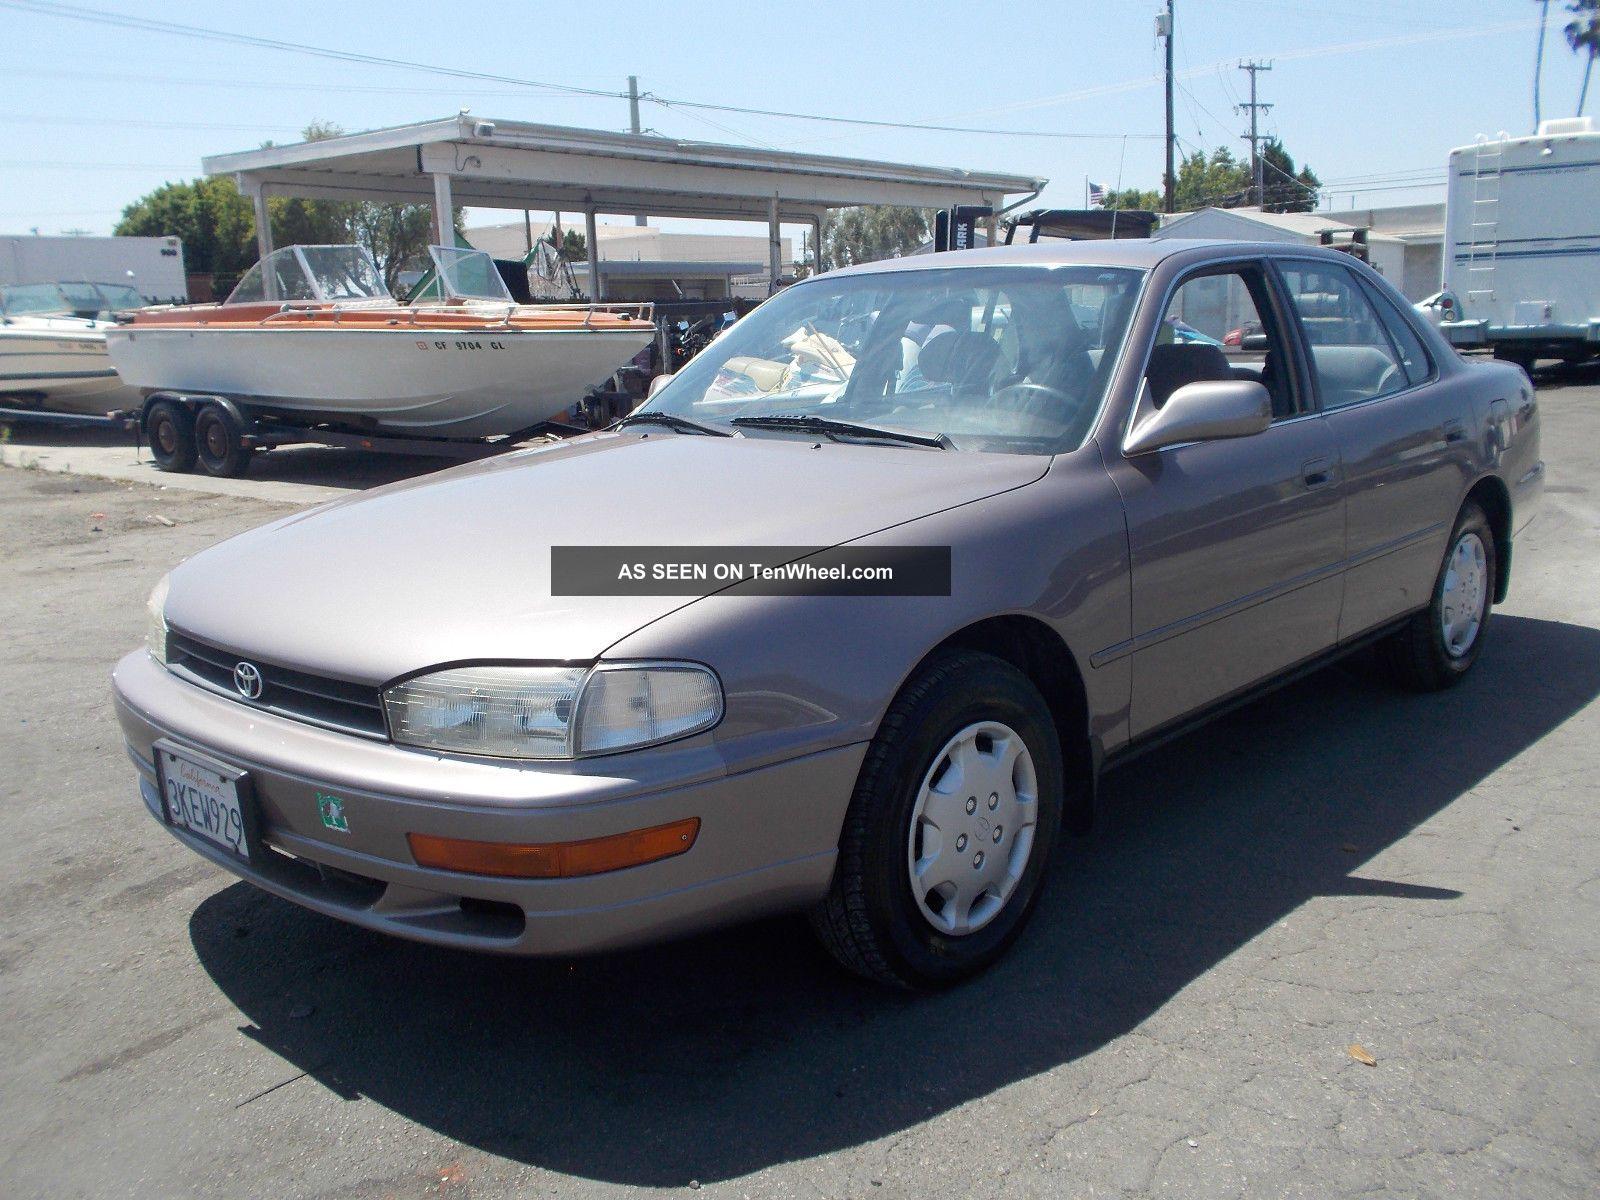 1994 Toyota Camry, Camry photo